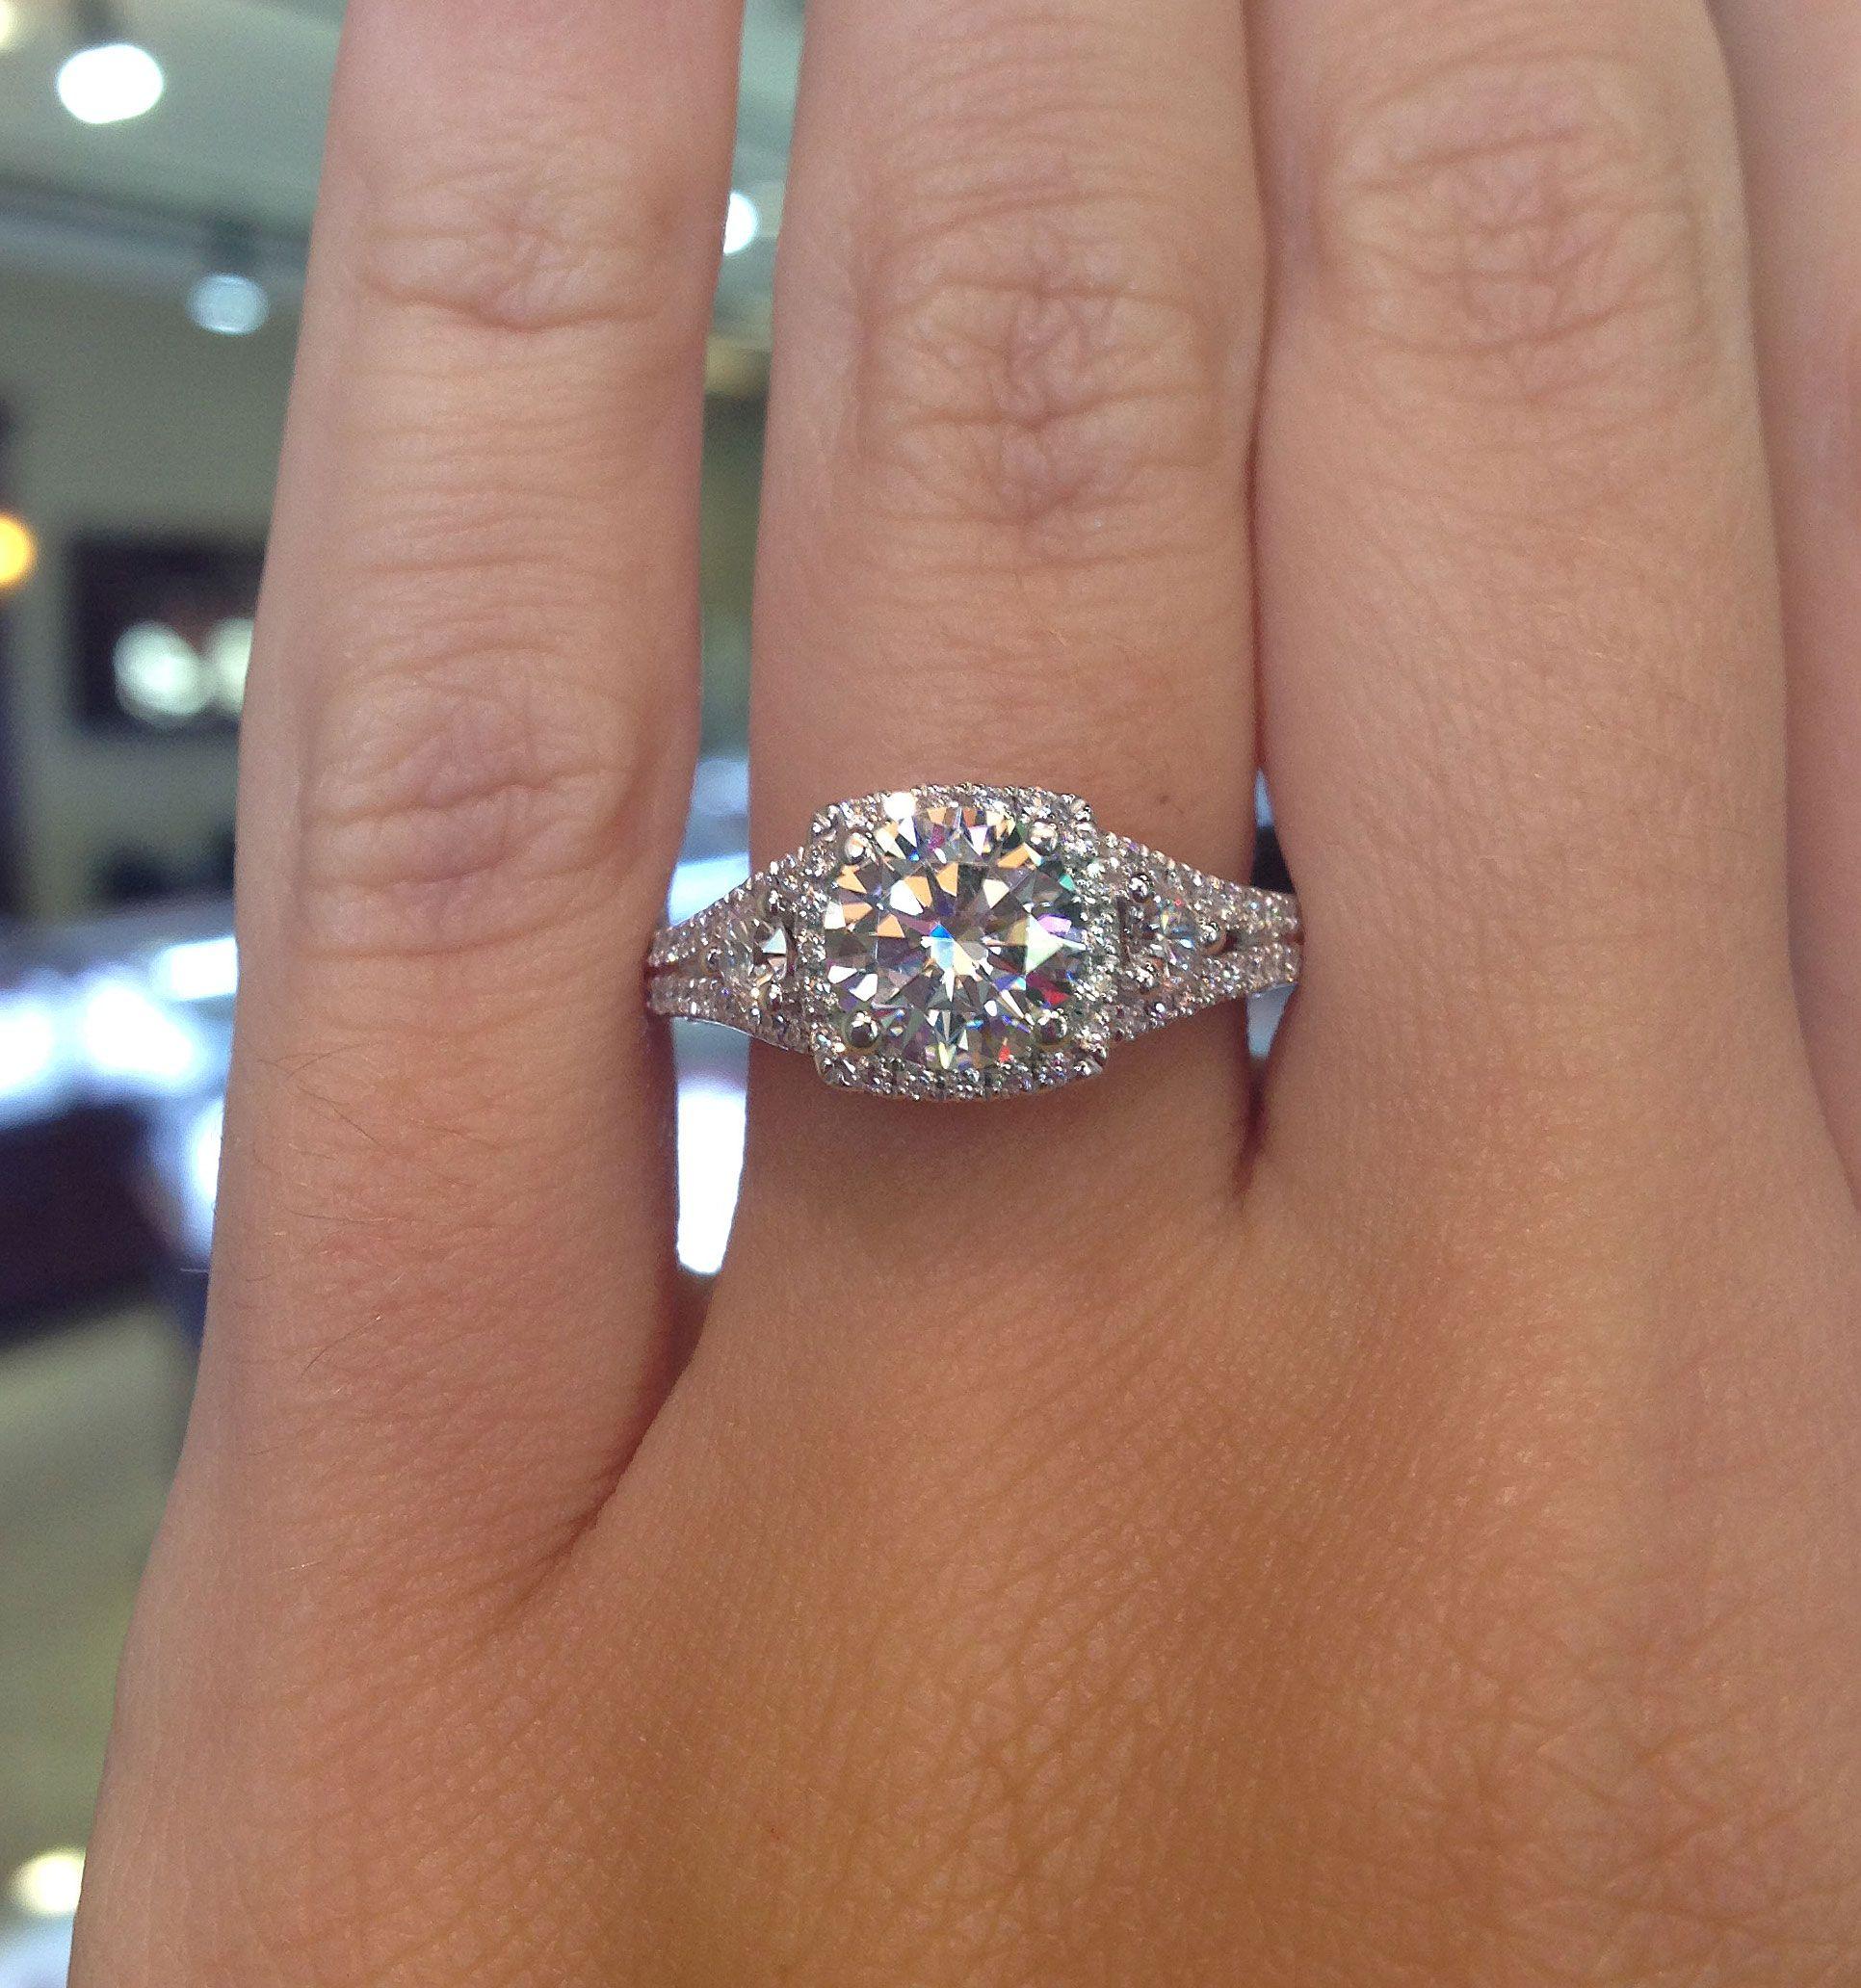 Verragio INS 7068CU GLD 1 00 ctw Insignia Engagement Ring Mounting